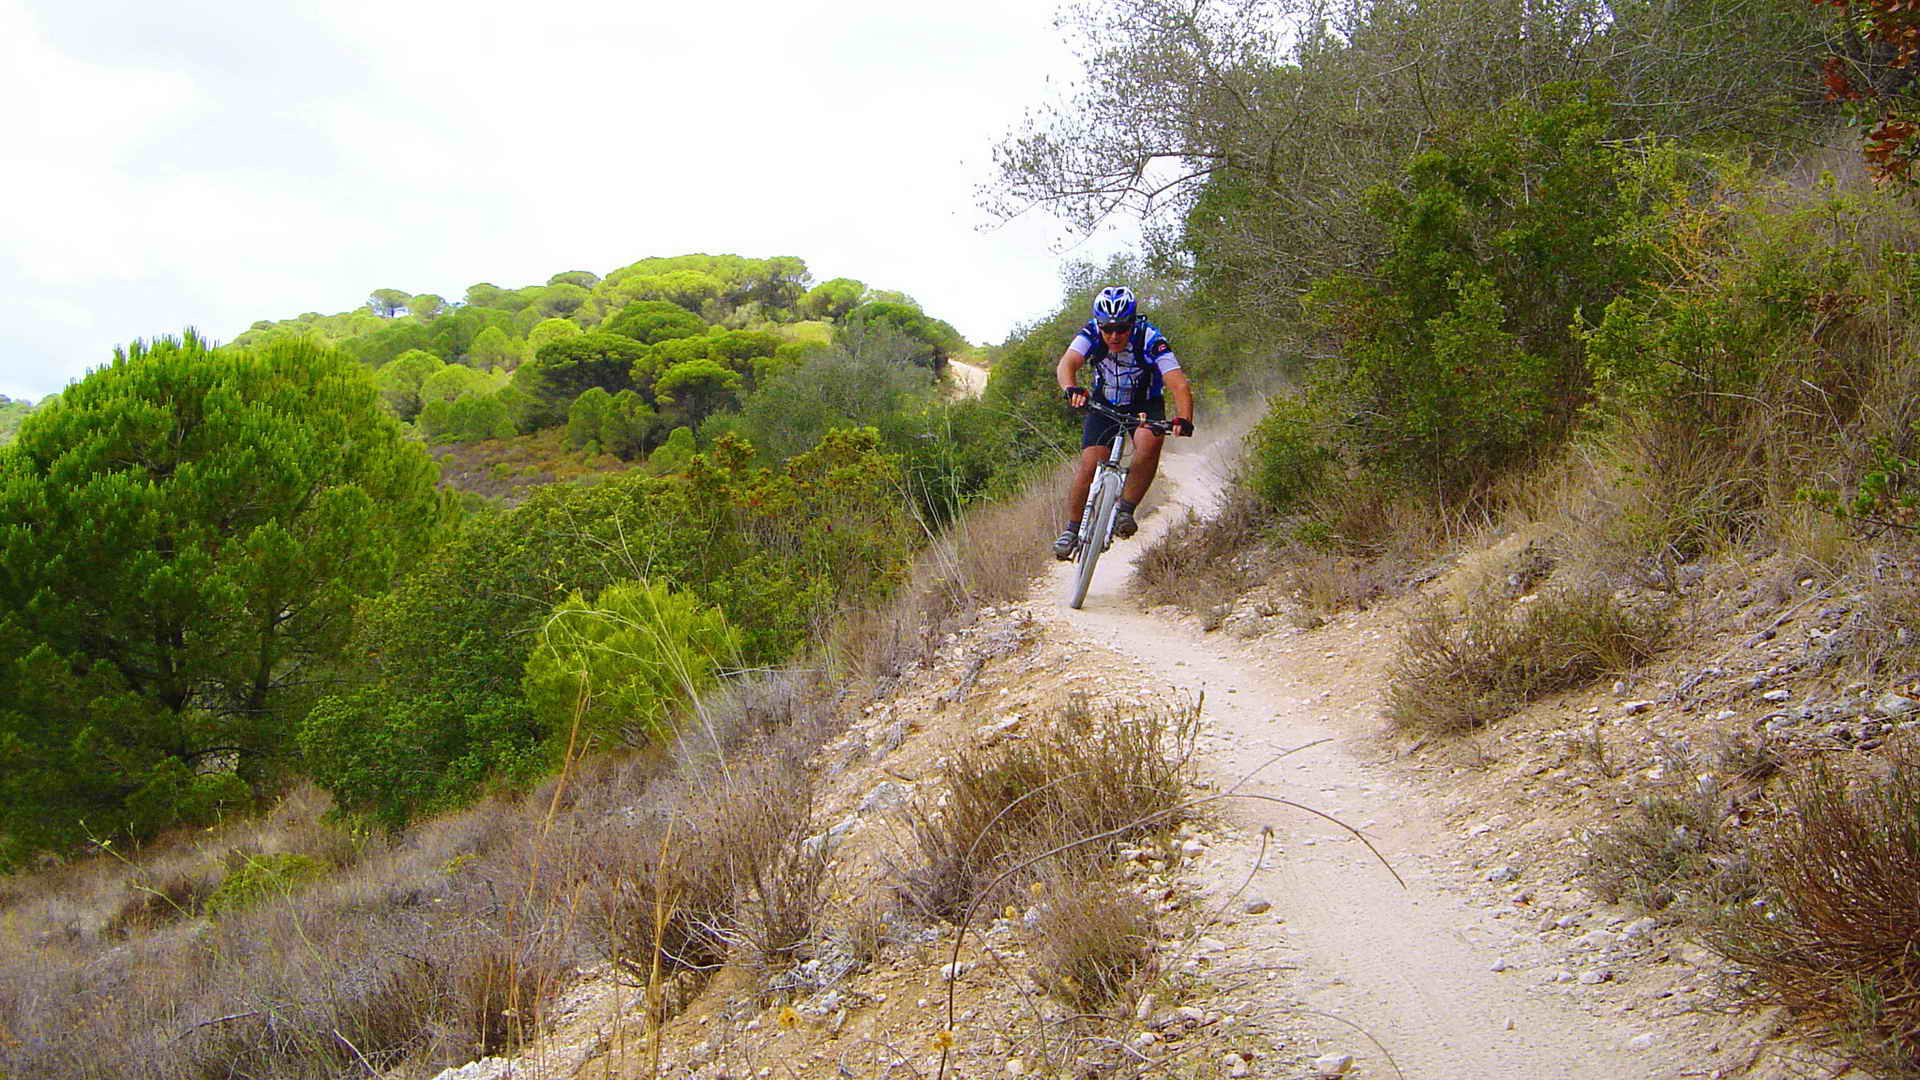 portugal-bike-tours-the-natural-park-of-arrabida-hills-1a.jpg